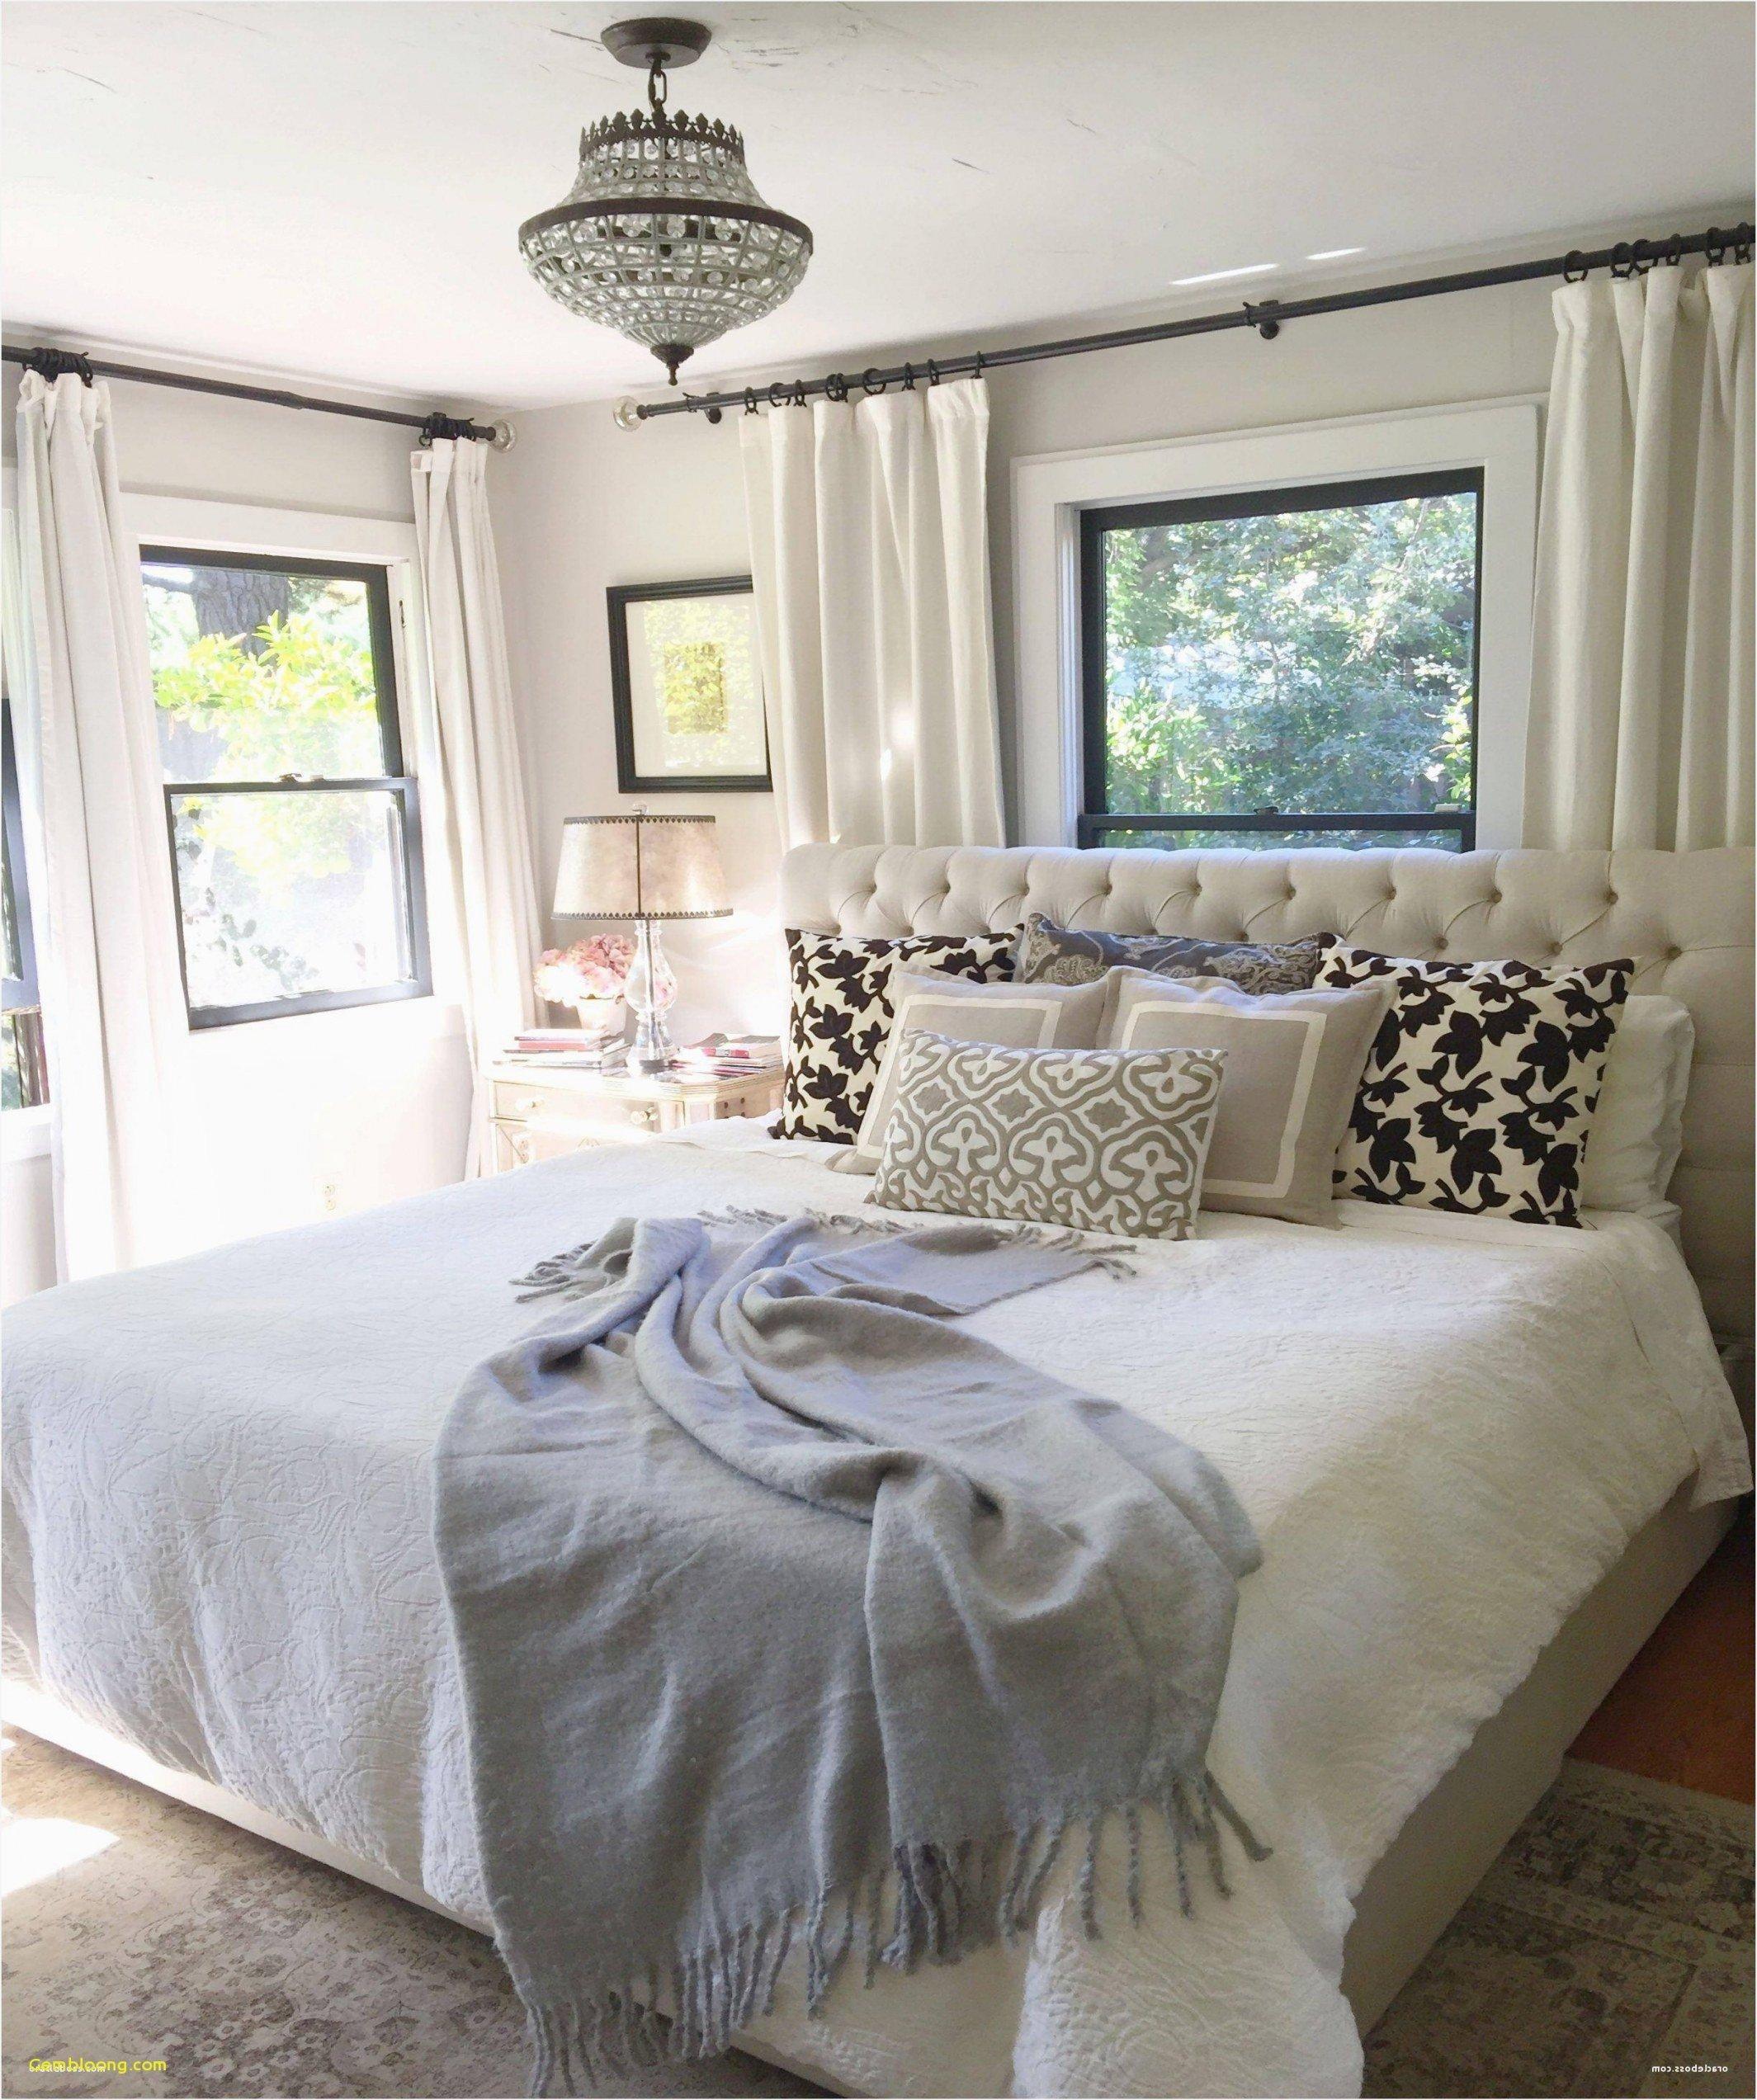 Girl Bedroom Set Full Luxury Teen Girls Bedroom Ideas 43 Lovely Teenage Girl Bedroom